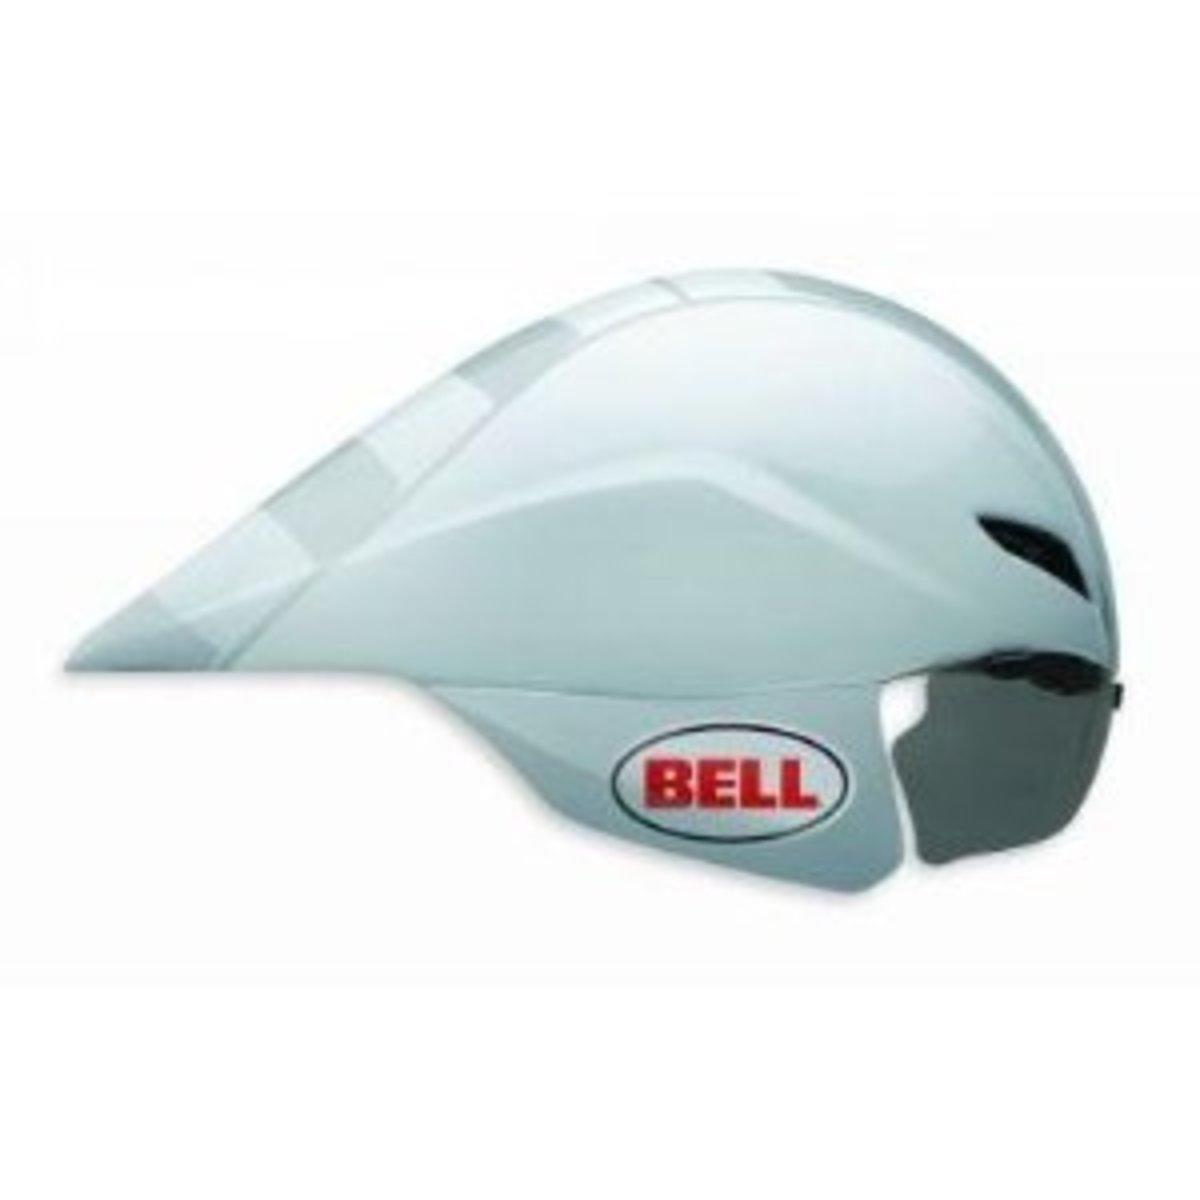 An integrated visor helps with the aerodynamics of the Bell Javelin Aero Helmet